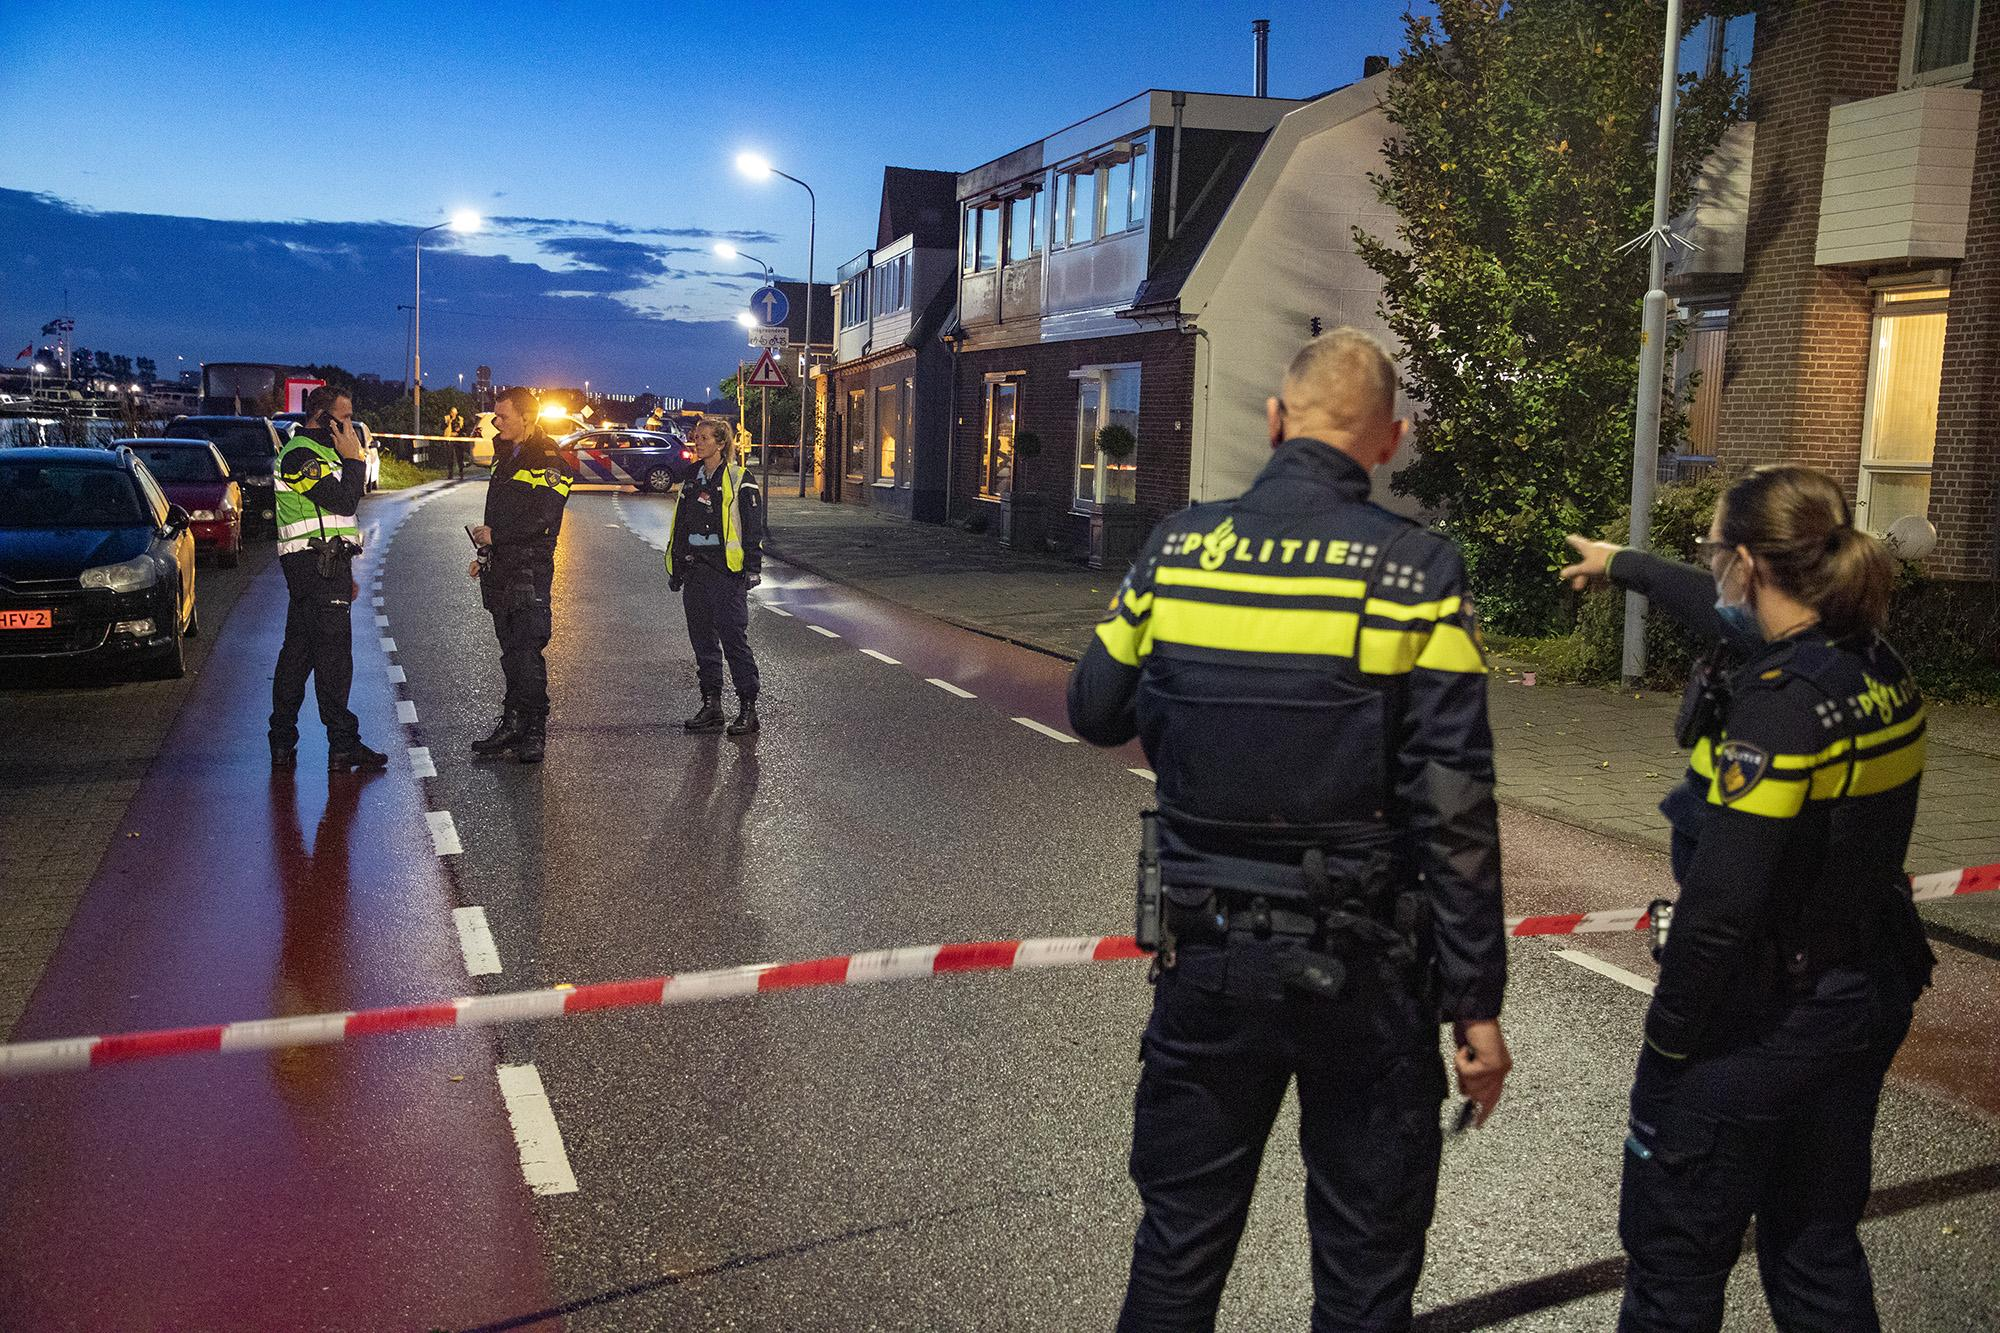 Ernstig gewonde man aangetroffen in Zwanenburg; vermoedelijk neergestoken